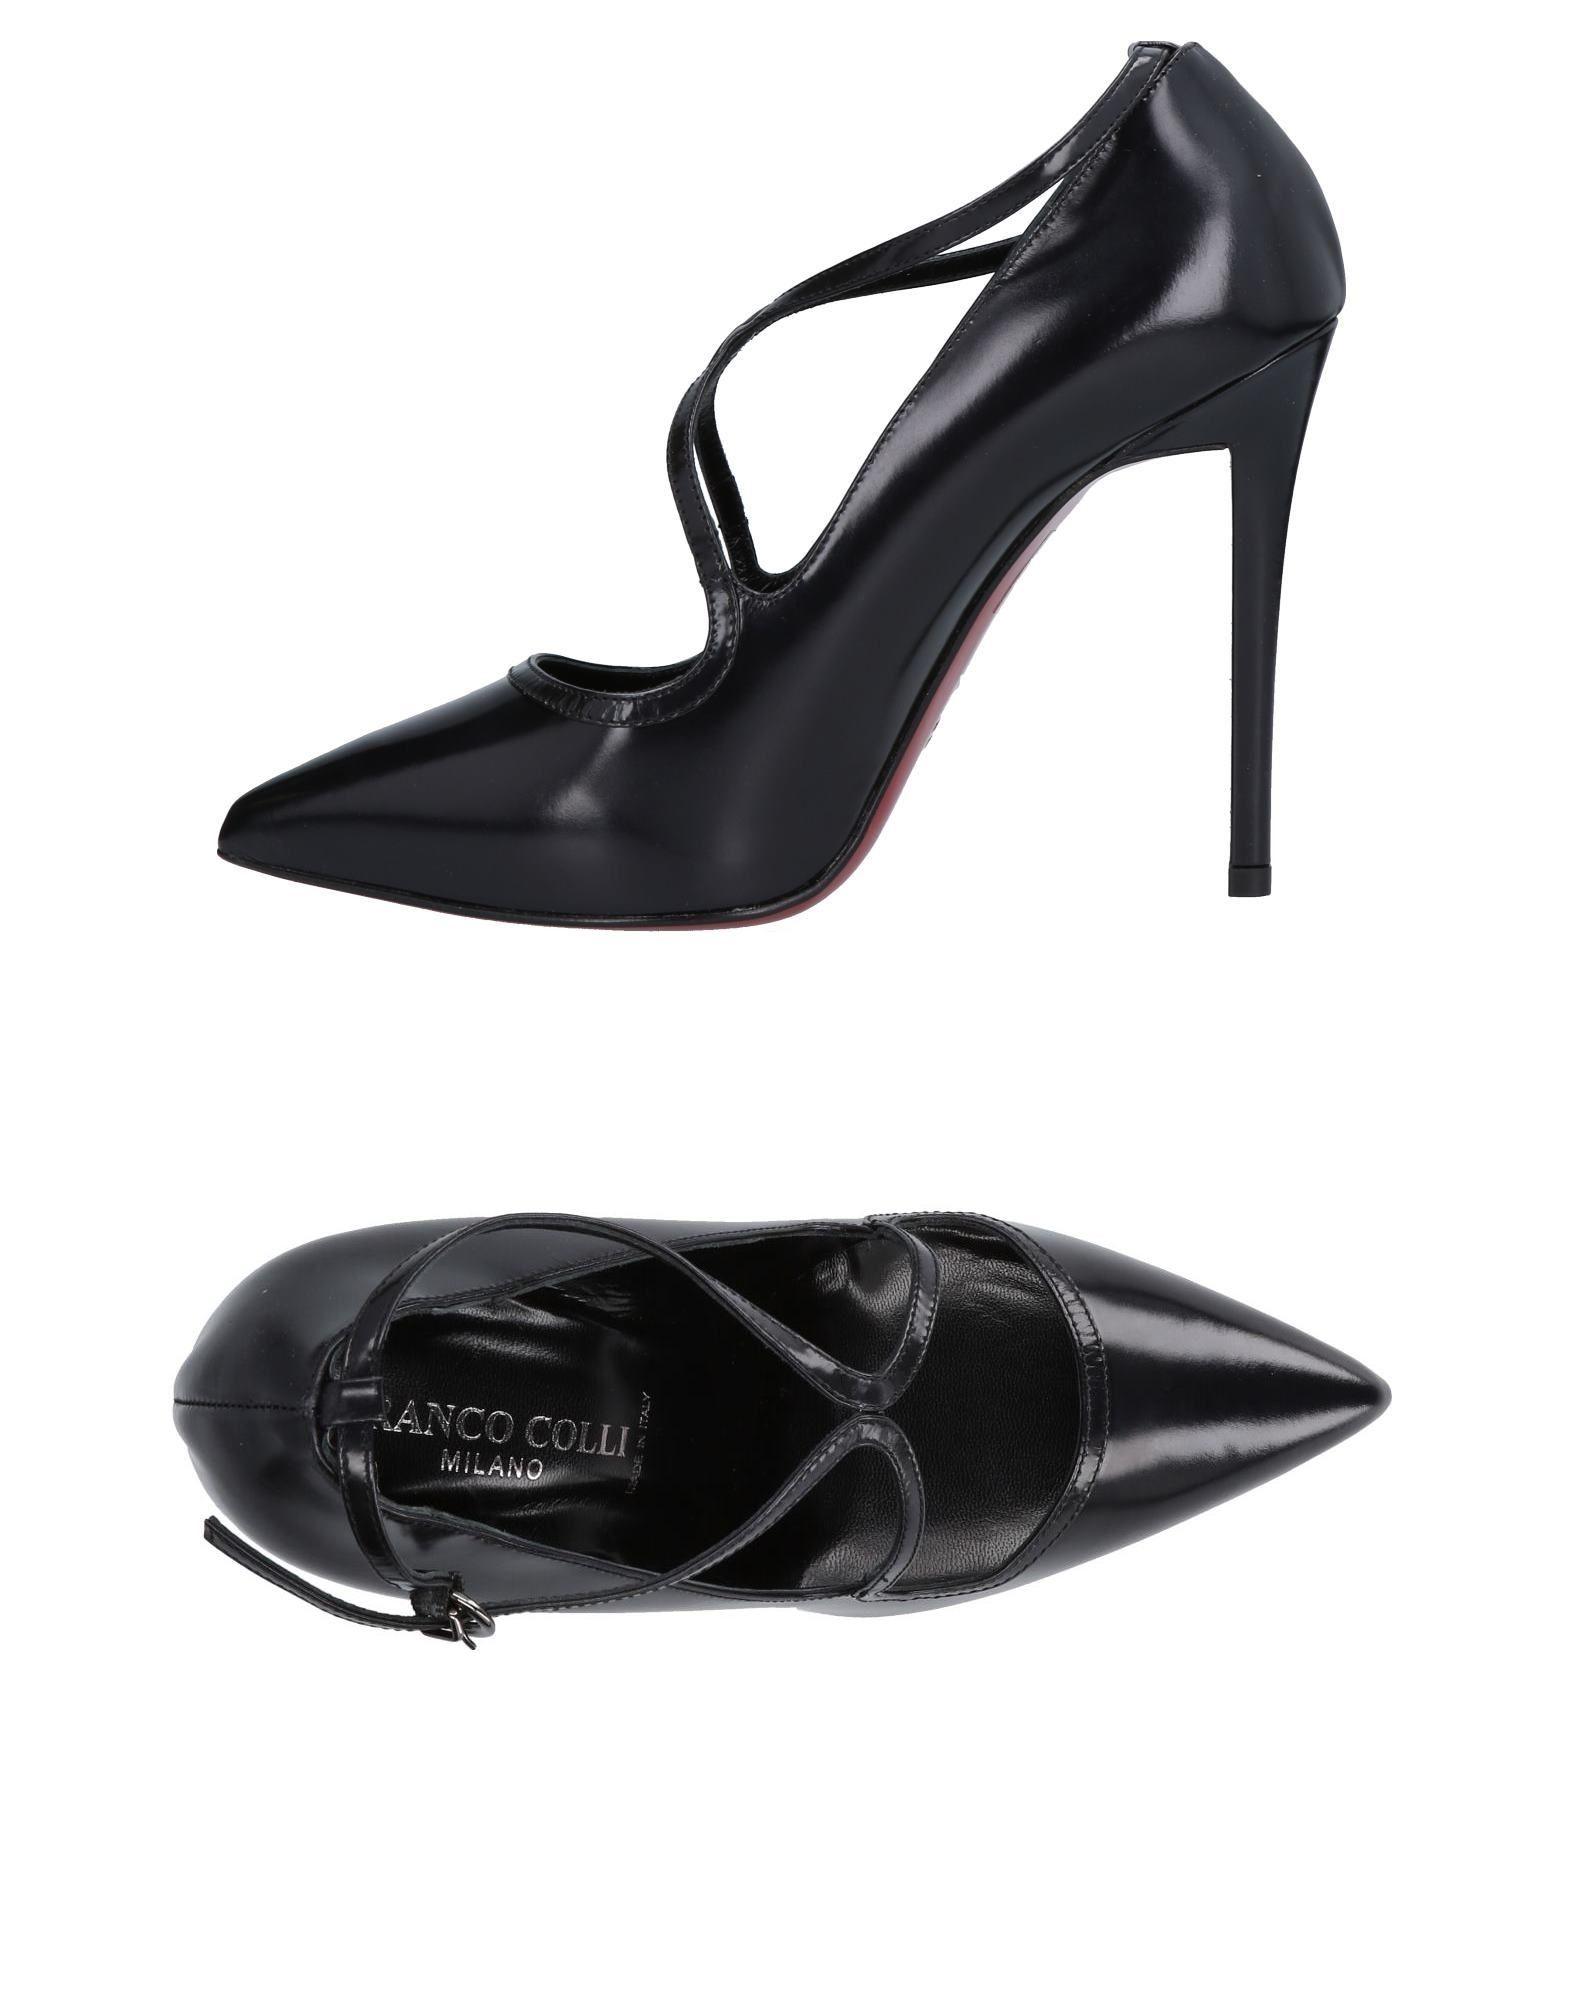 Franco Colli Pumps Damen beliebte  11471764OO Gute Qualität beliebte Damen Schuhe 2eff78